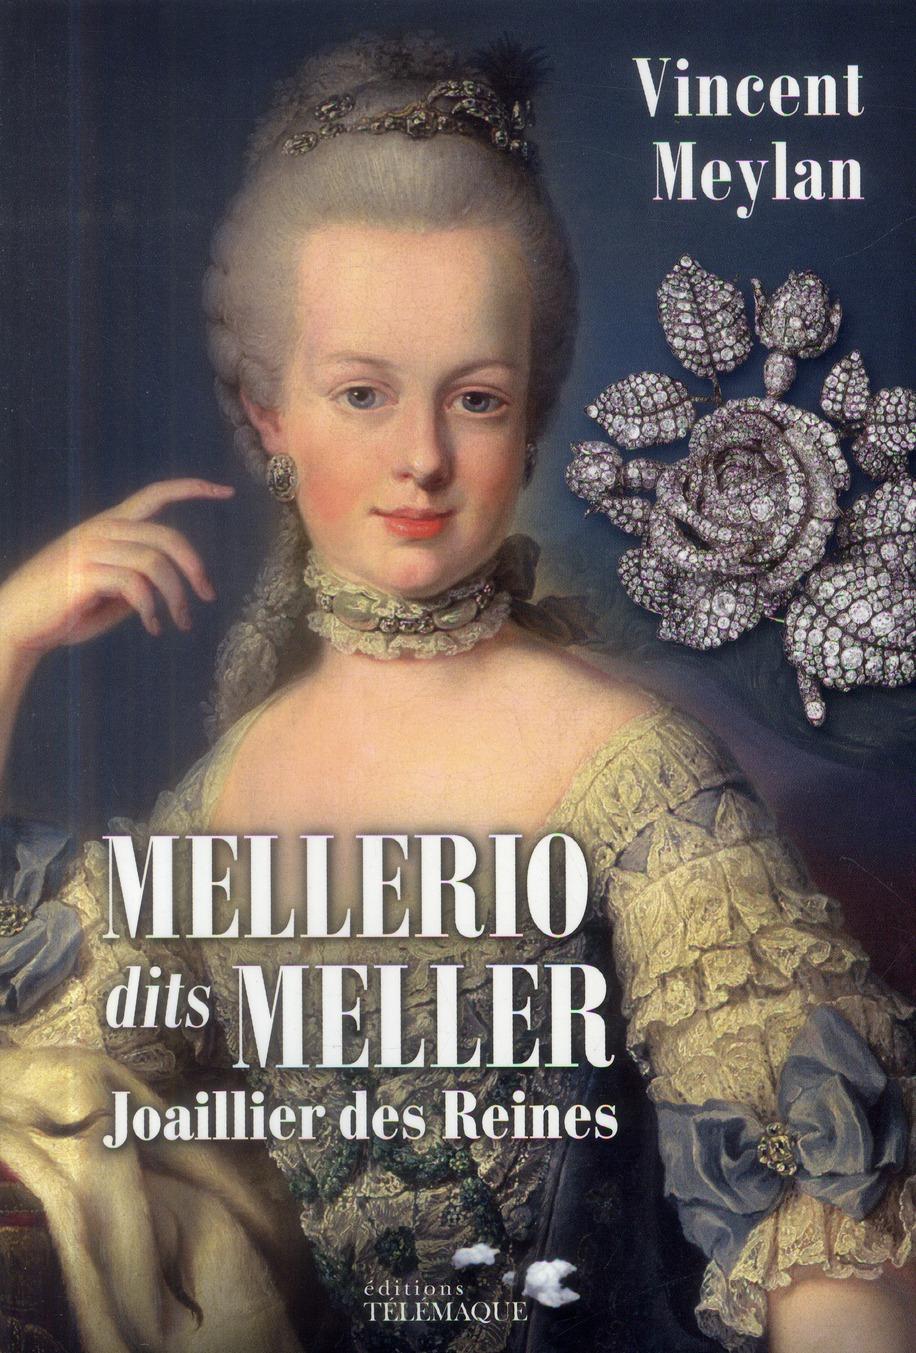 Mellerio dits Meller ; joaillier des reines